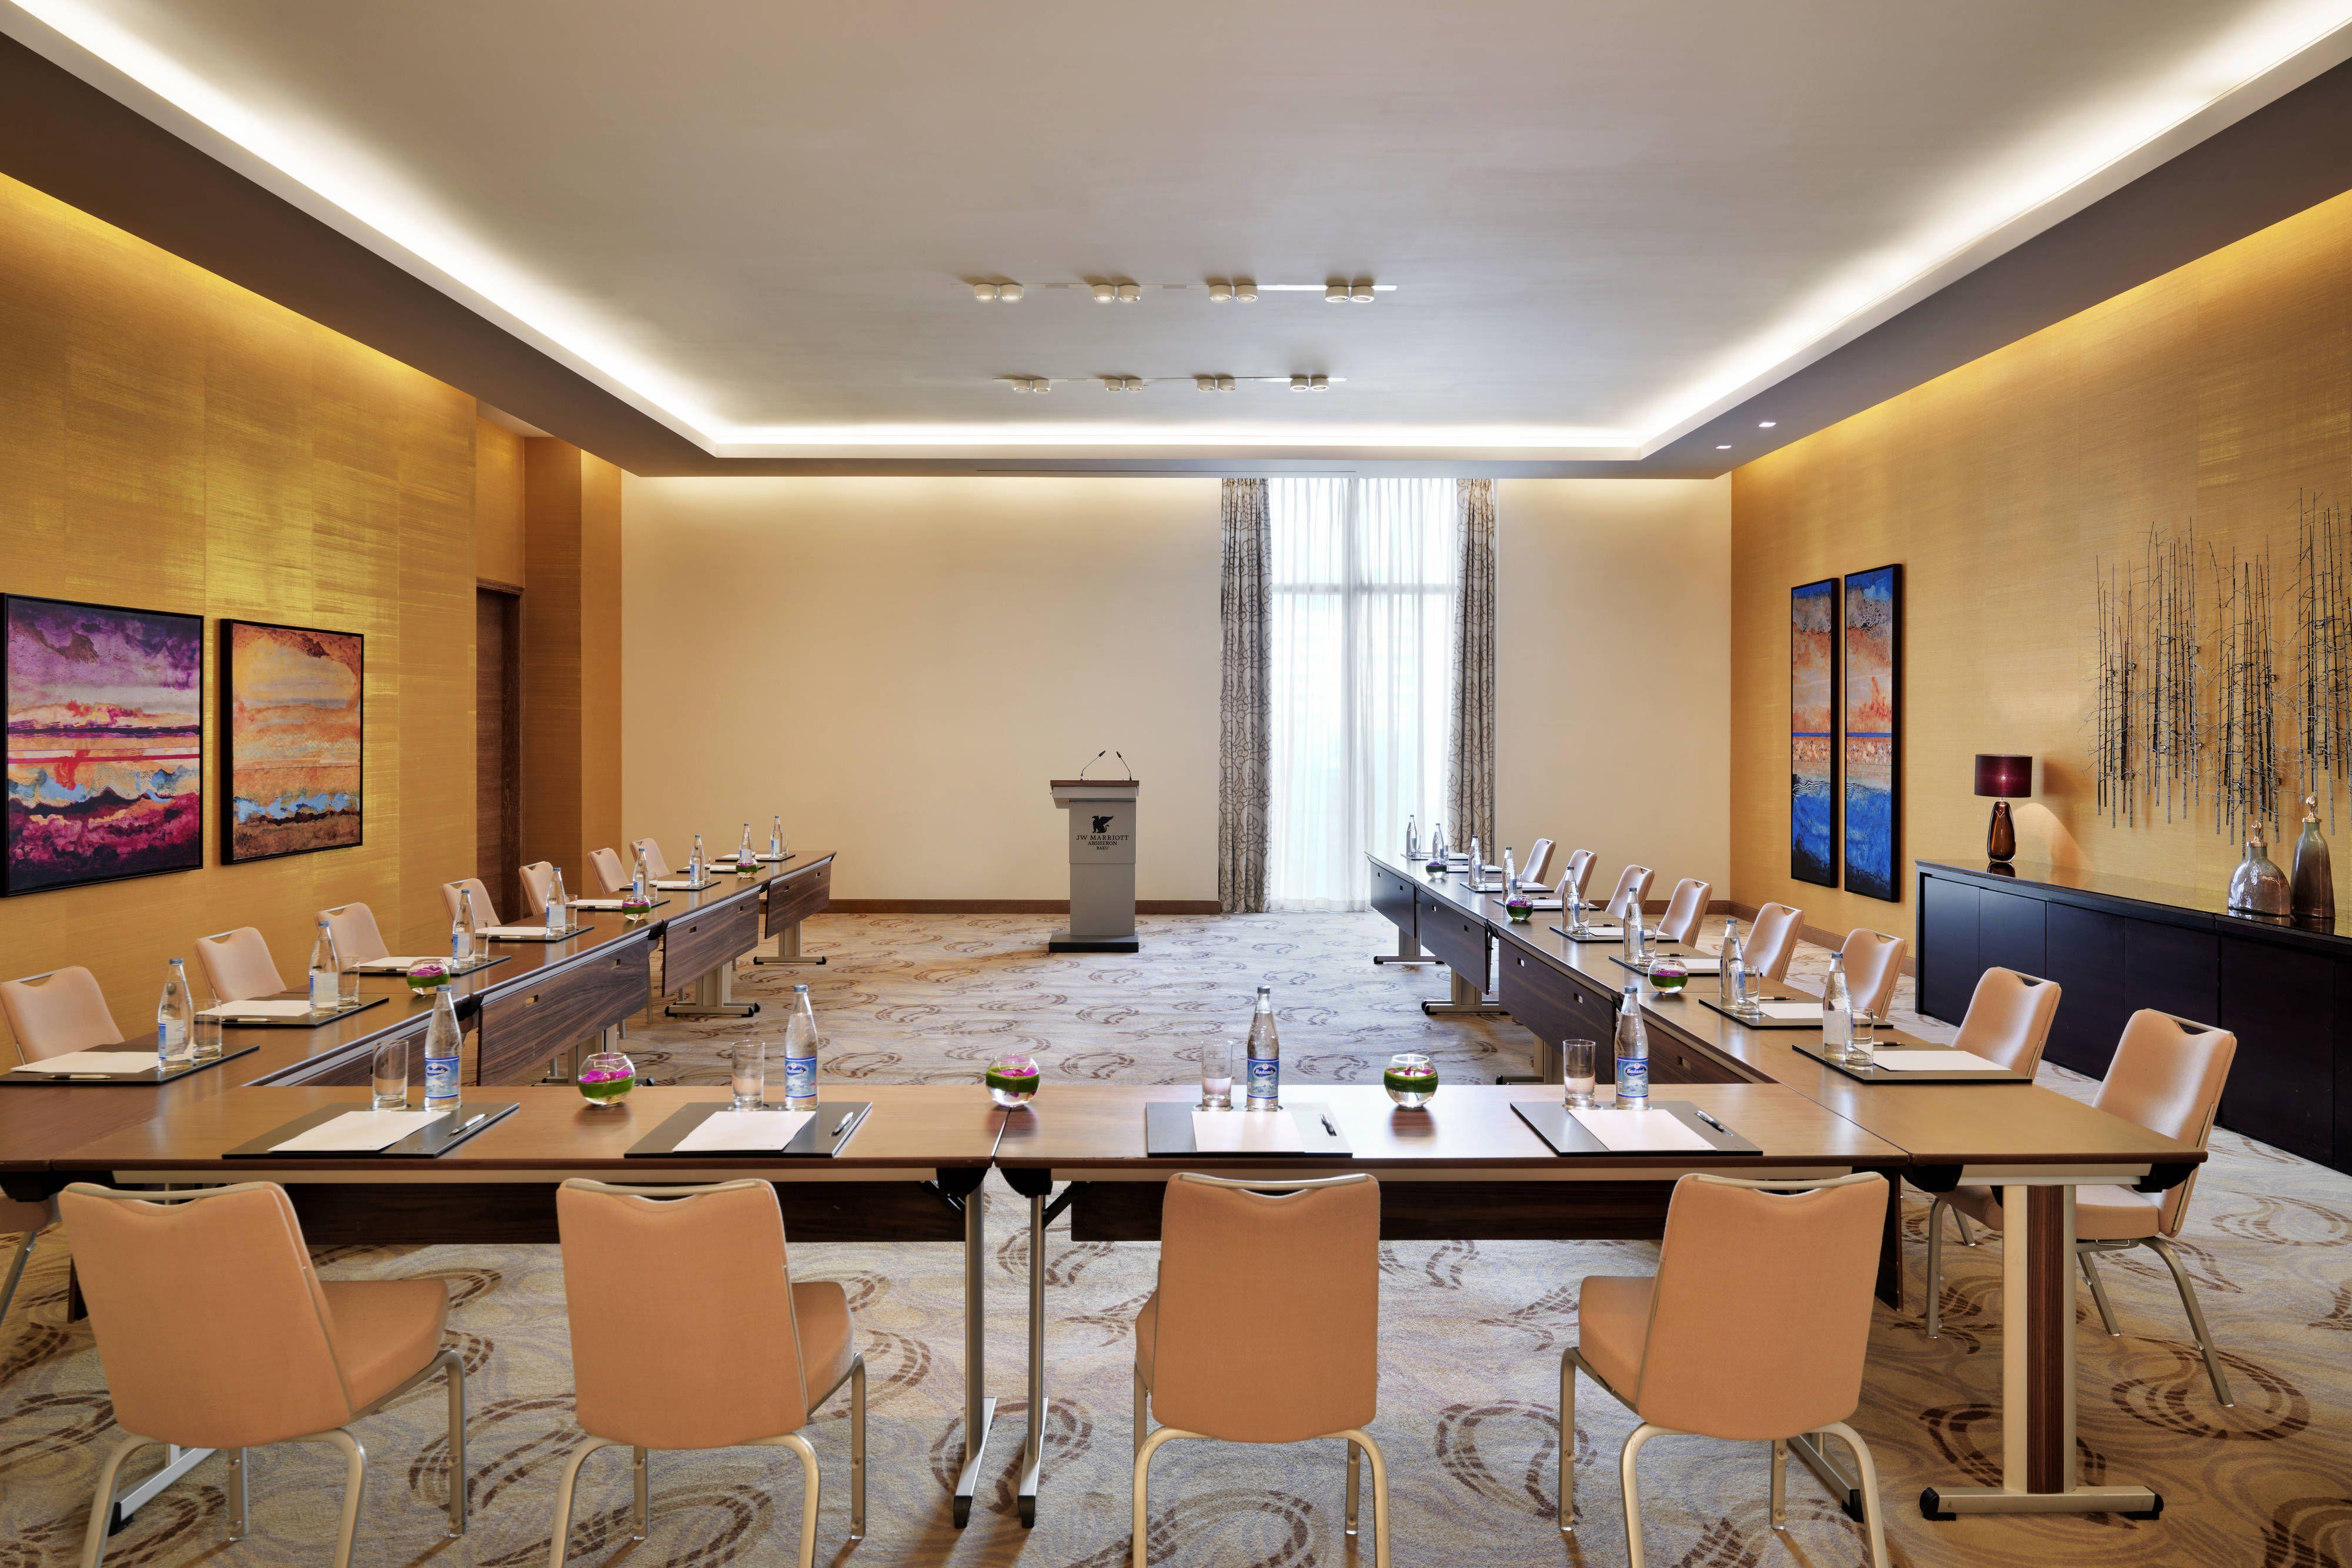 Jw Marriott Absheron Baku Khojasan Meeting Room U Shape Visiting Memorable Guest Hotel Design Hotel Meeting Hotel